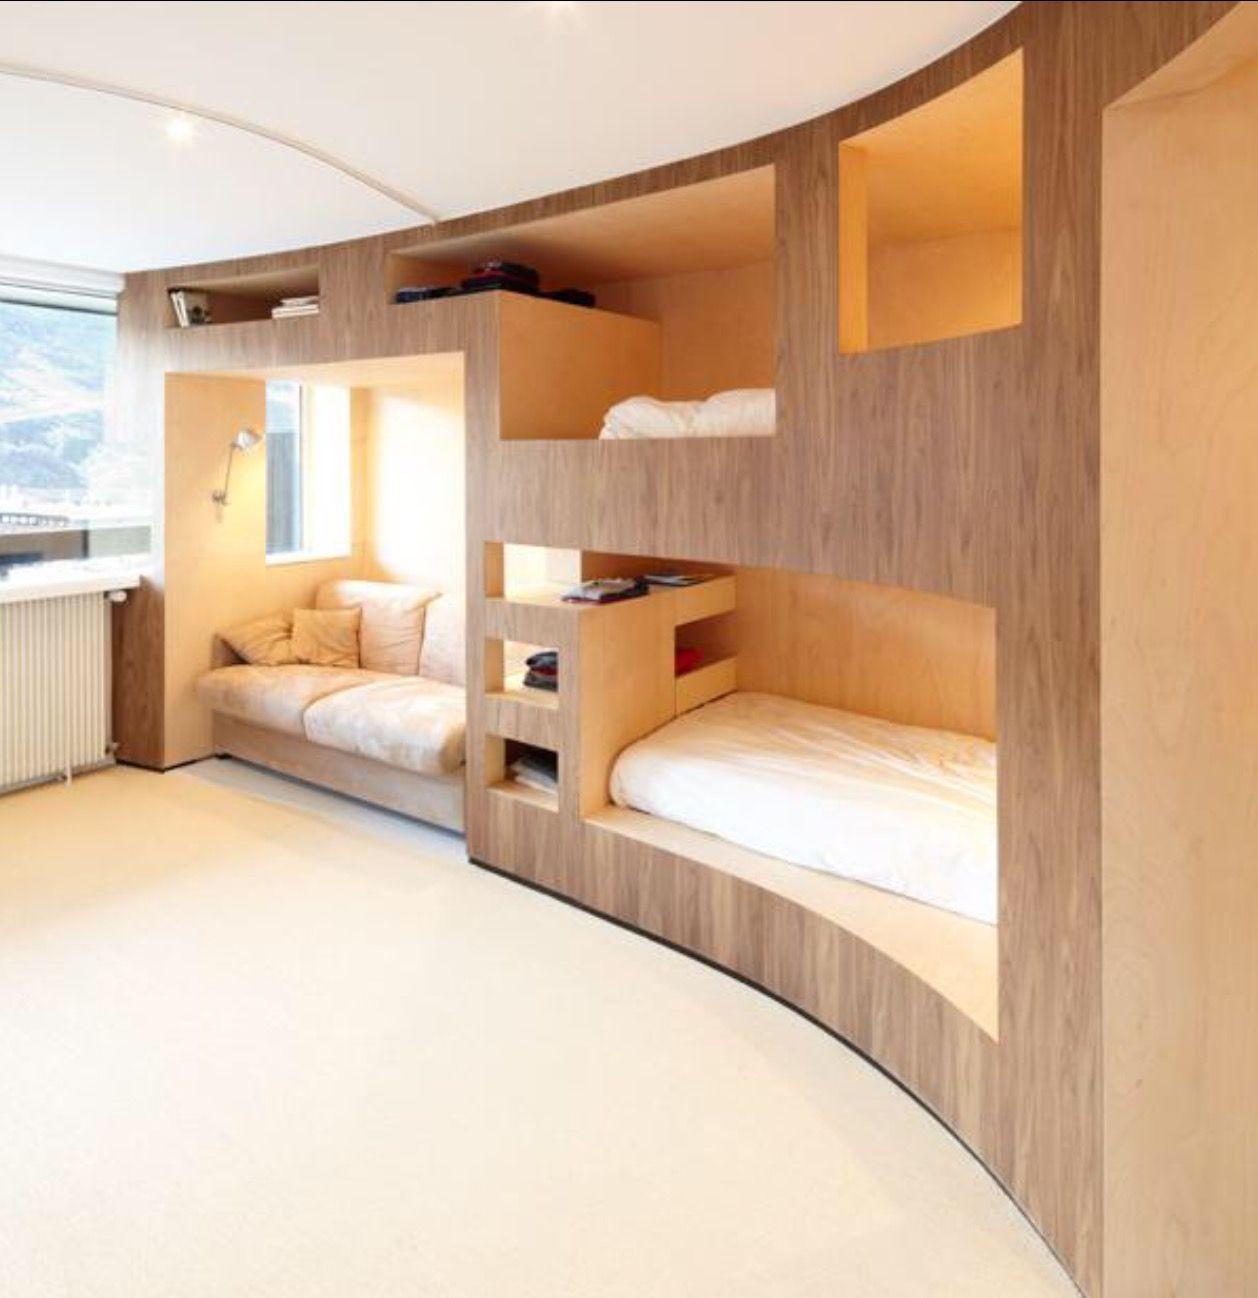 Pin by Chris Turney on genius house ideas Modern loft